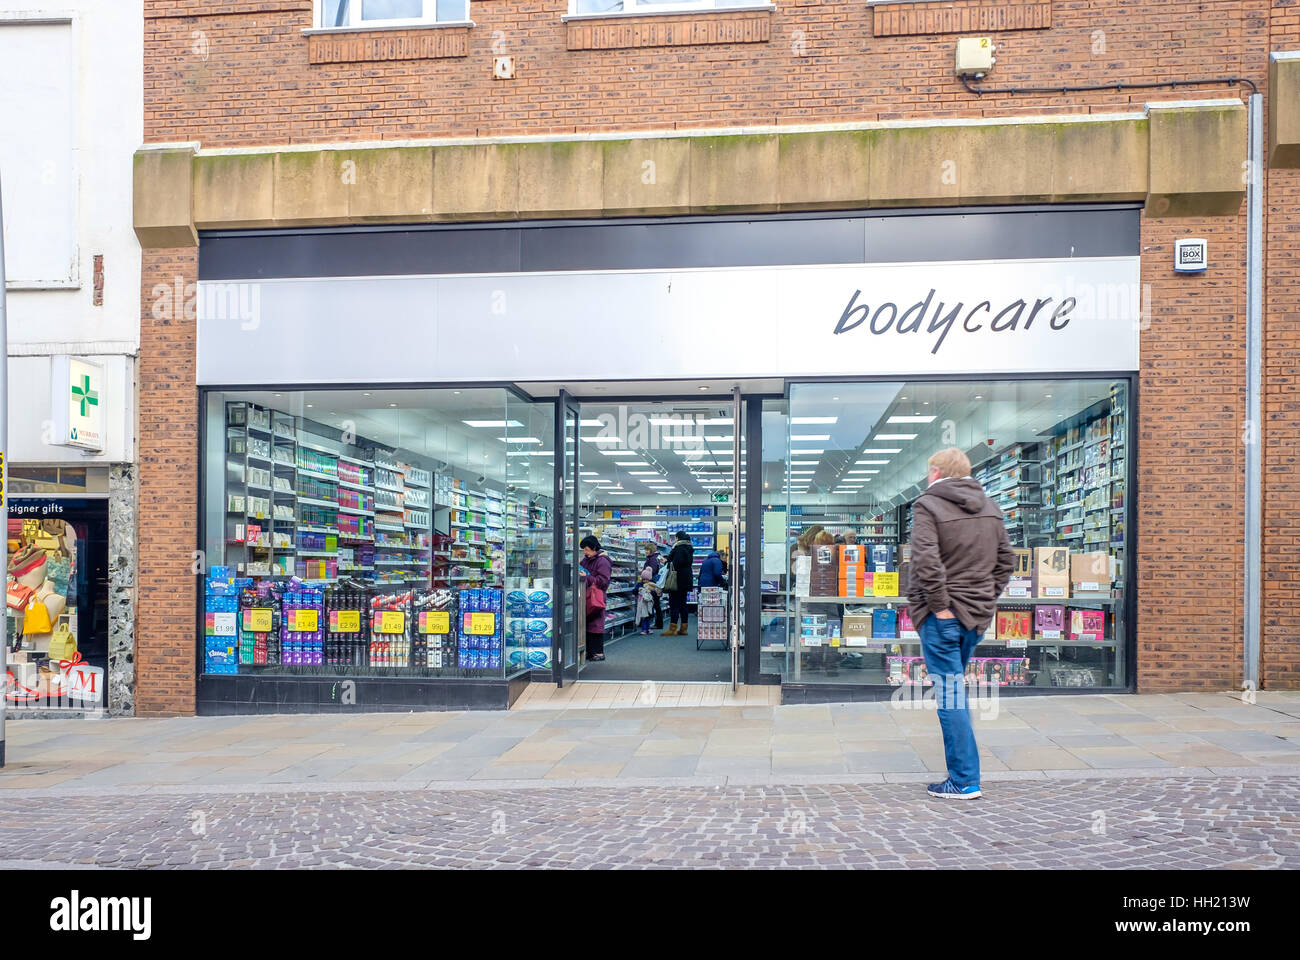 Bodycare Barrow in Furness - Stock Image